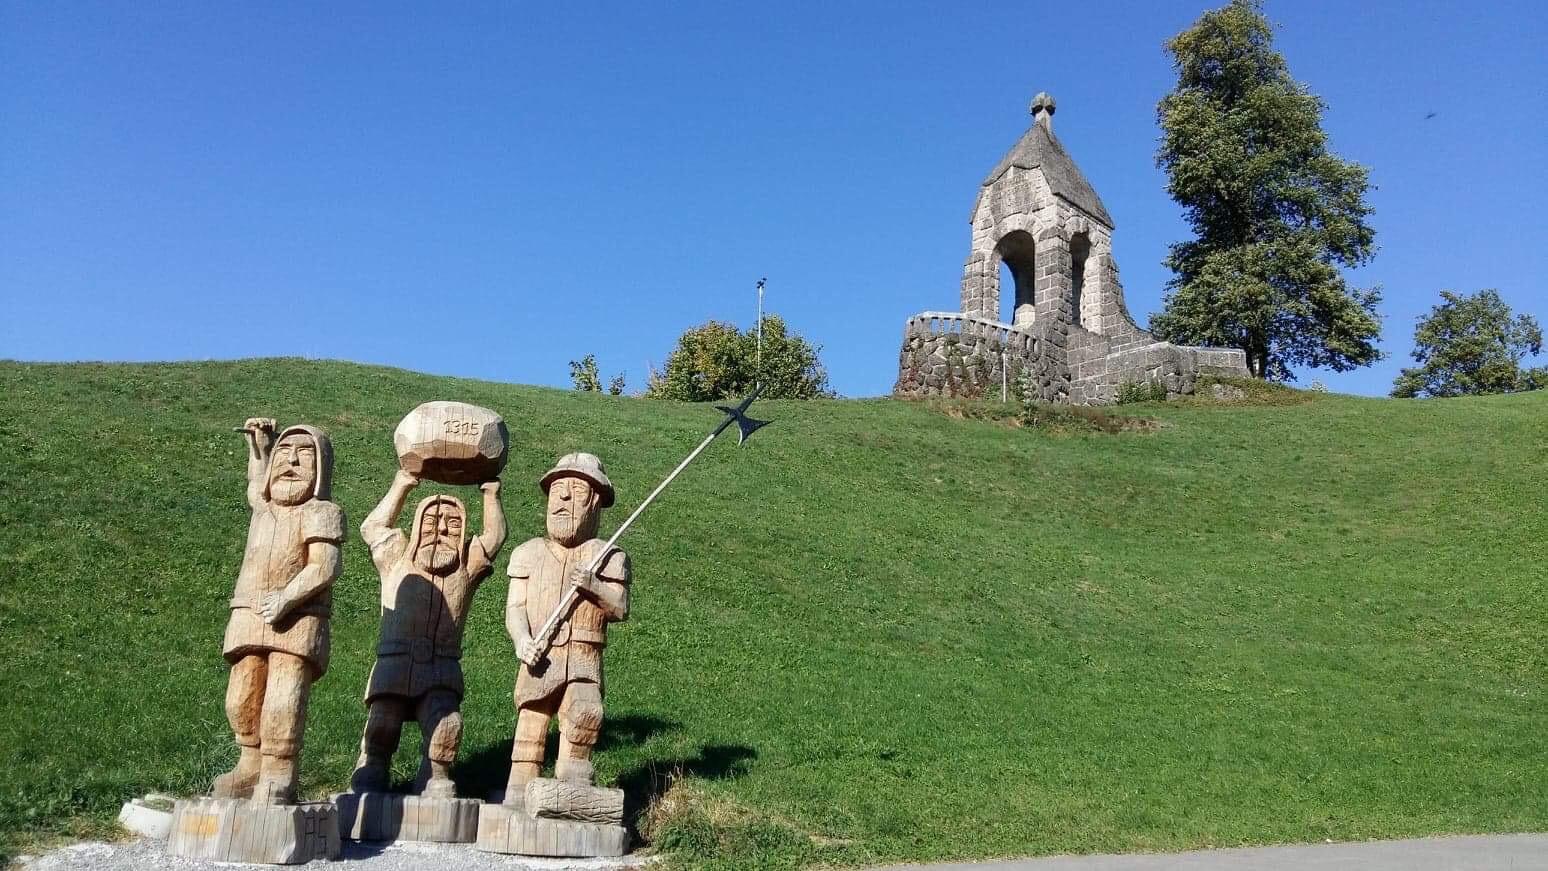 Monument of the Battle of Morgarten